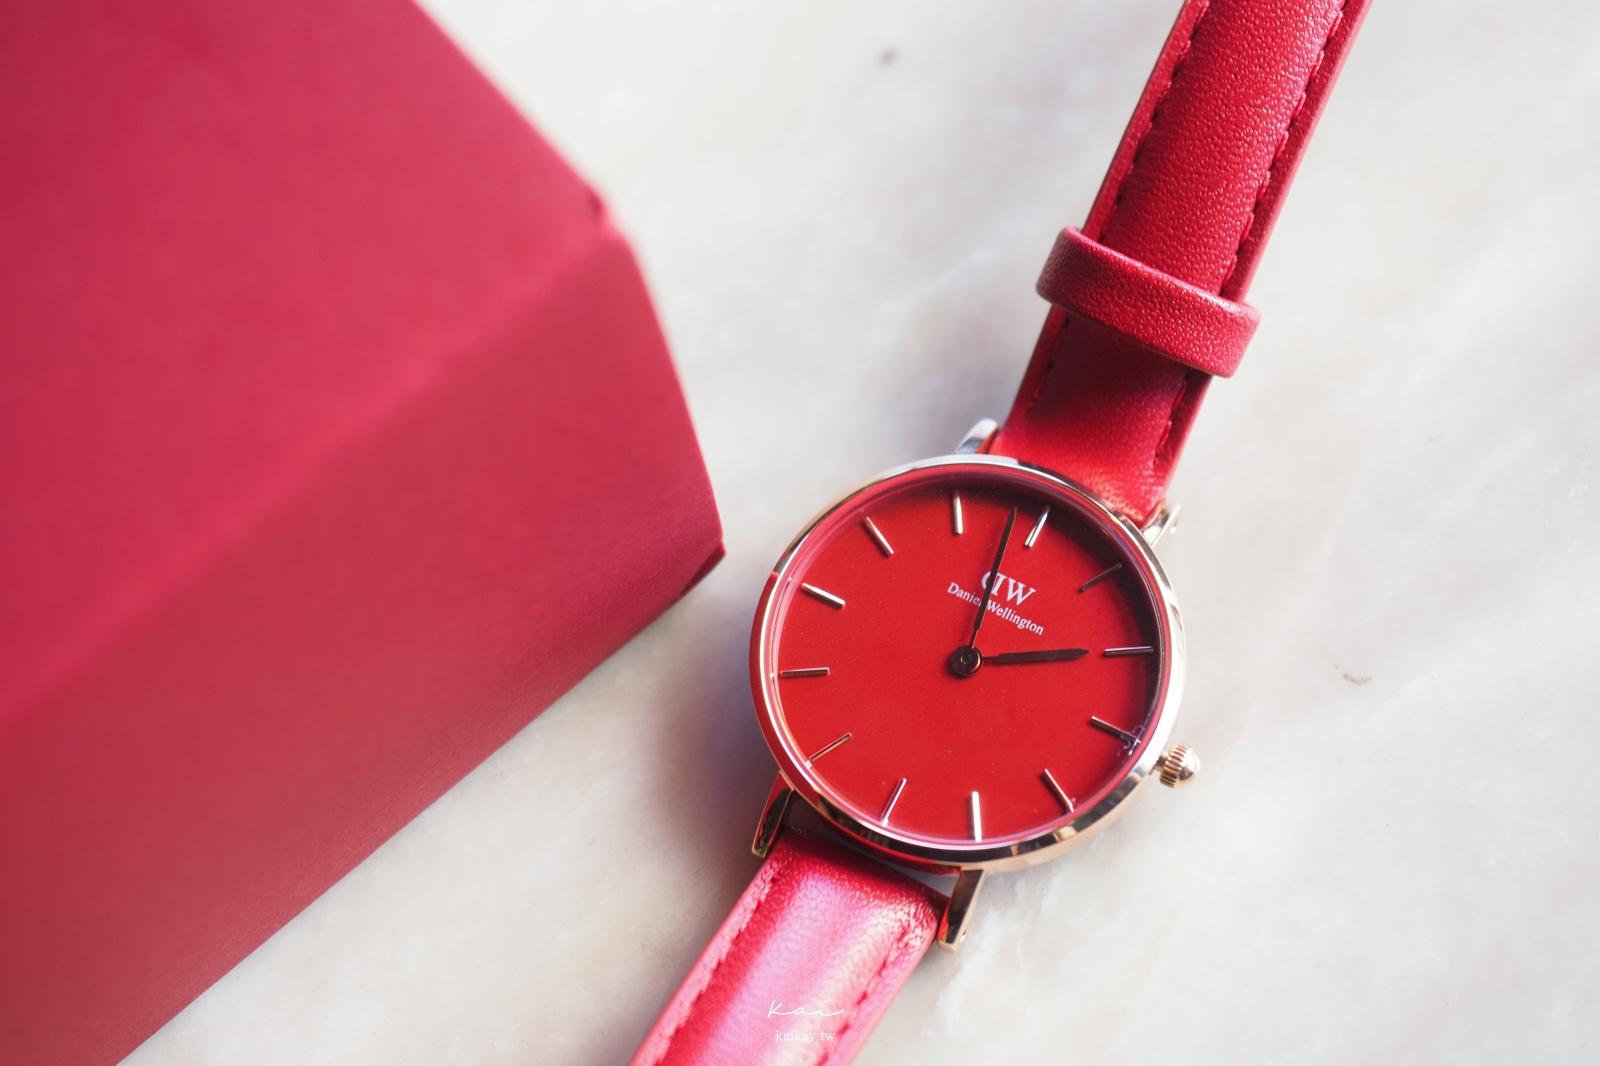 ☆【DW折扣碼】限時限量!Daniel Wellington SUFFOLK Red手錶、首飾。2021折扣碼:kaikay